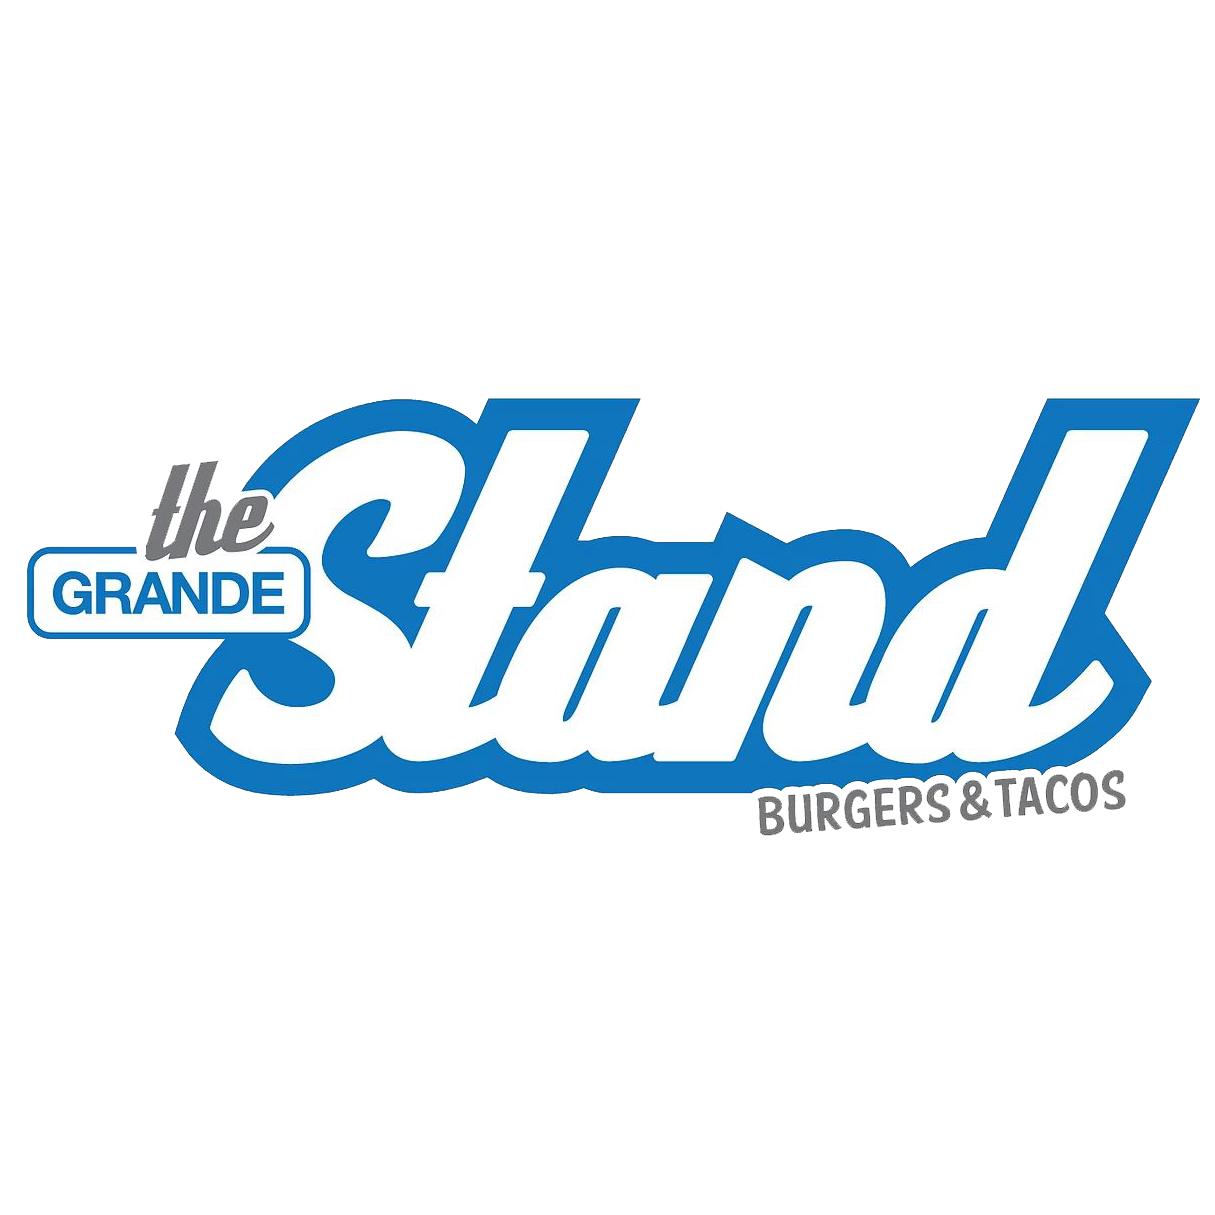 The Grande Stand